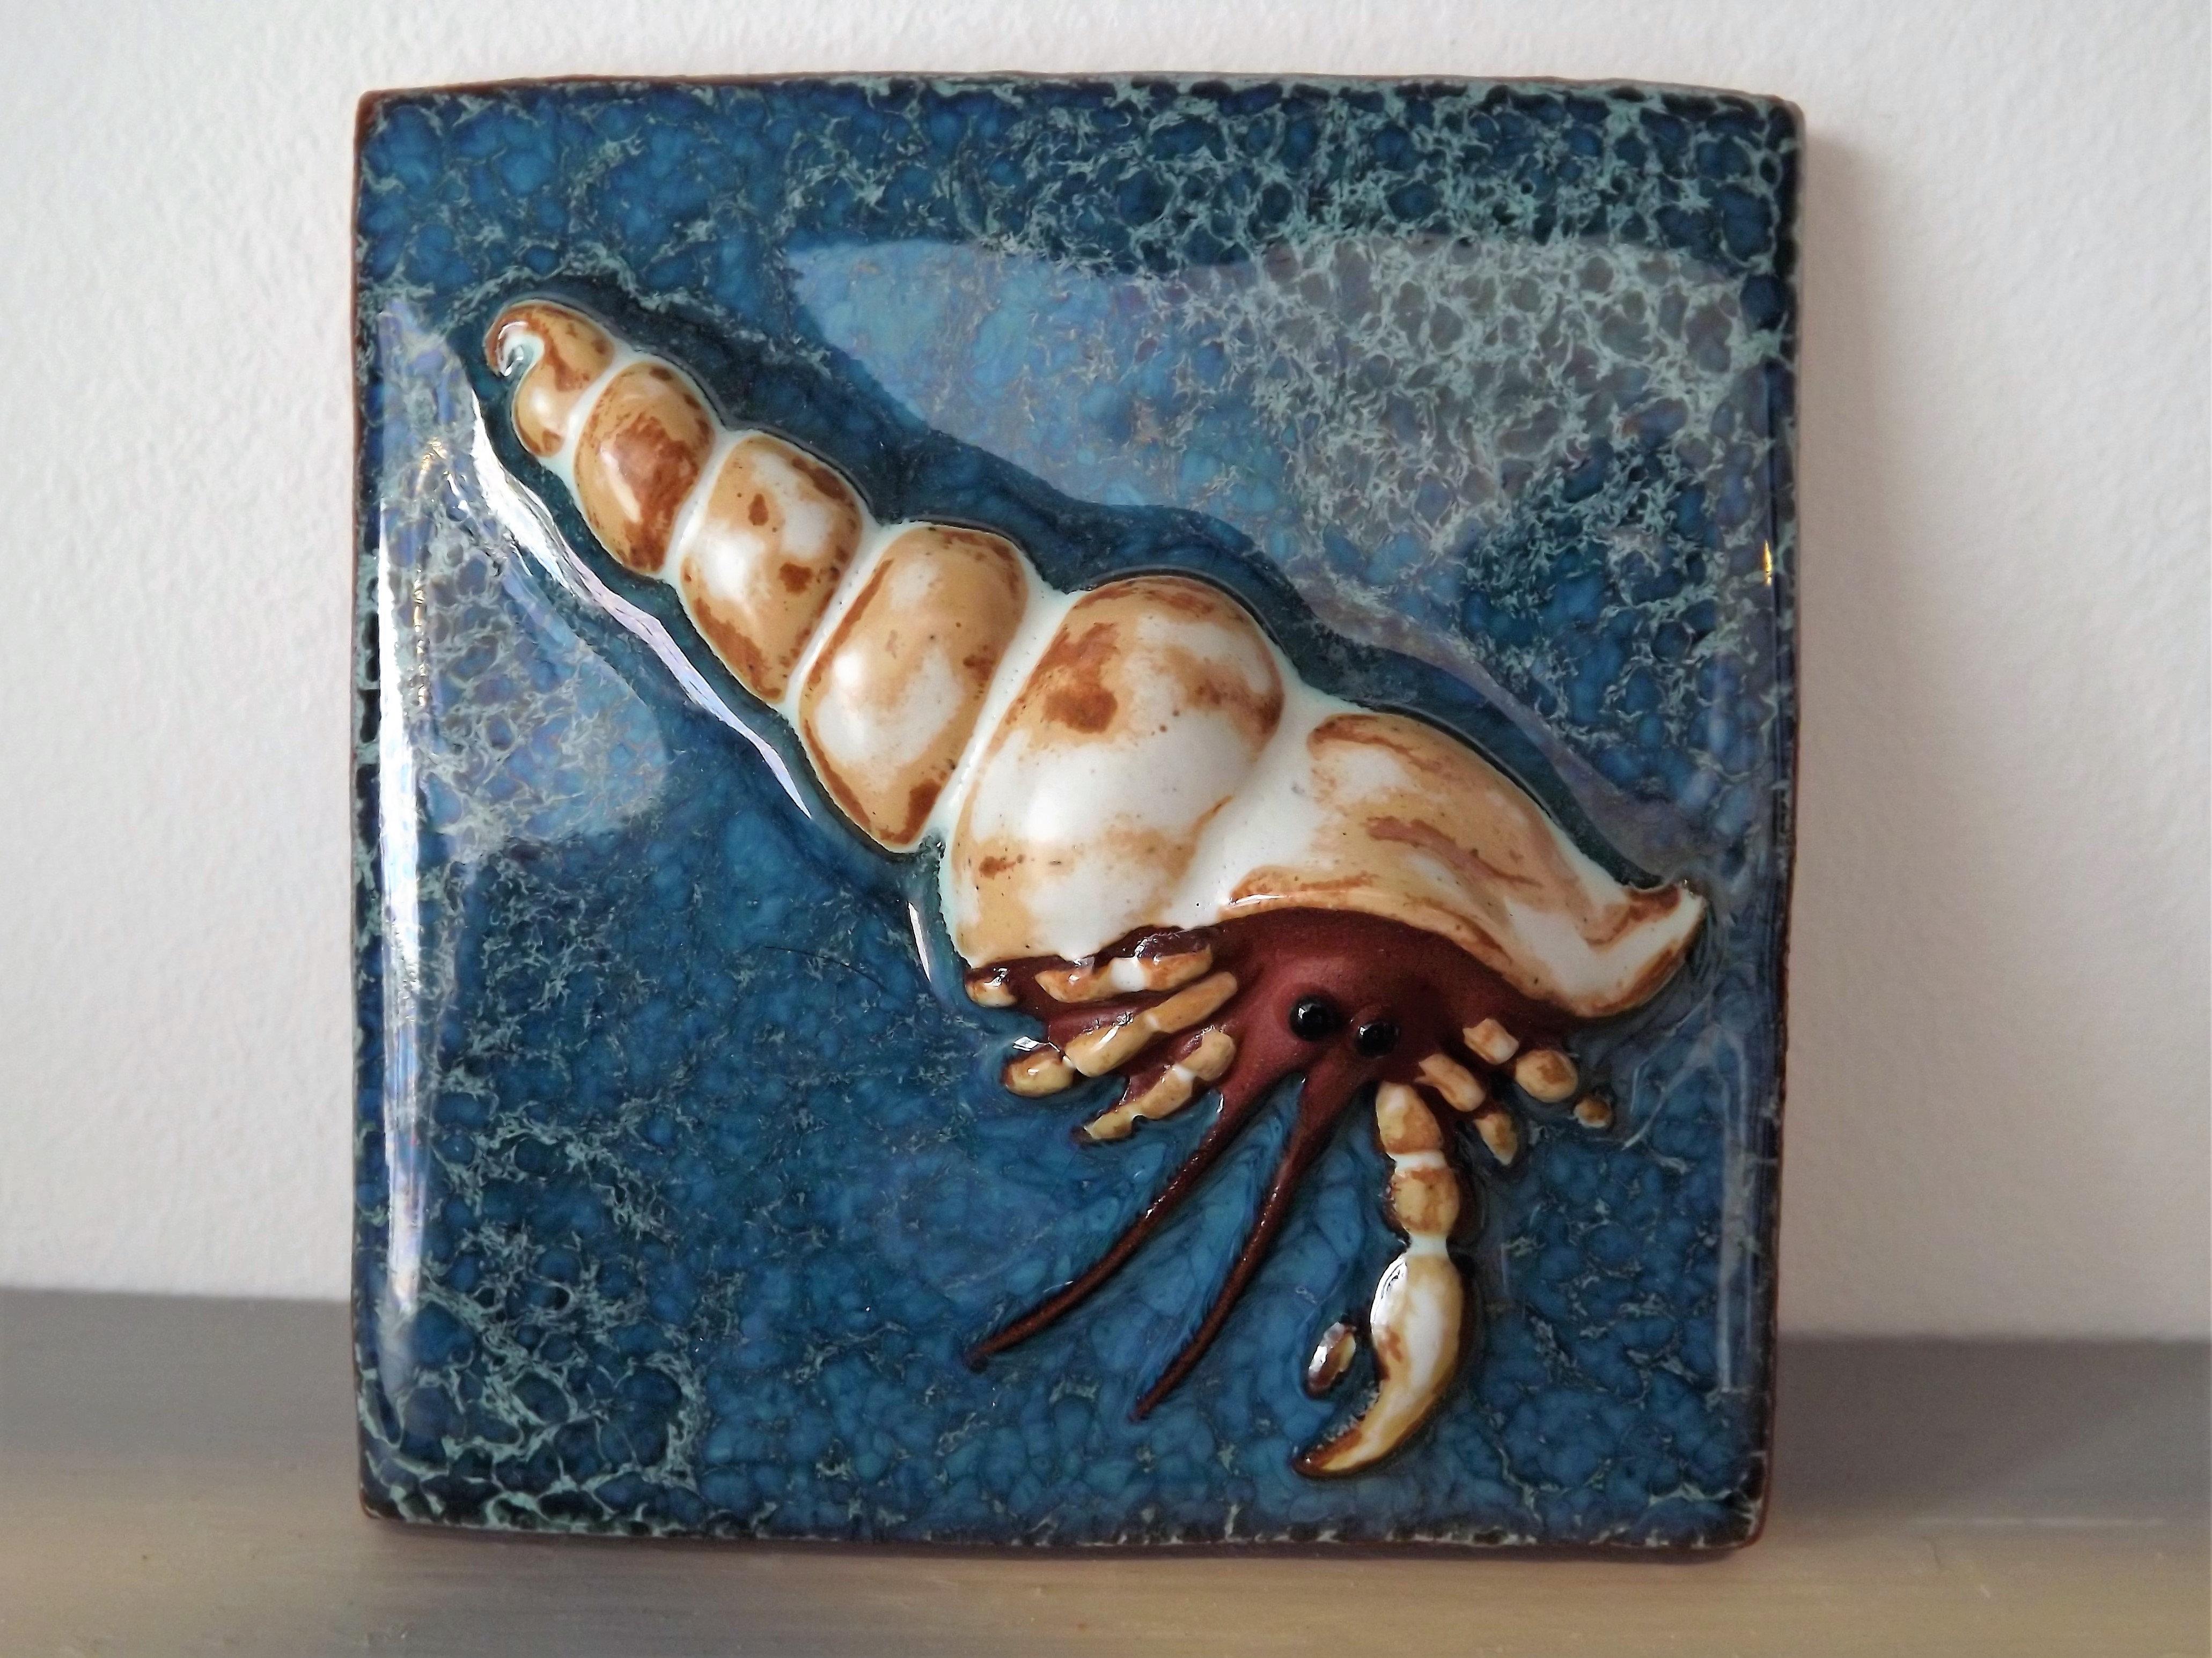 Hermit Crab Art Tile